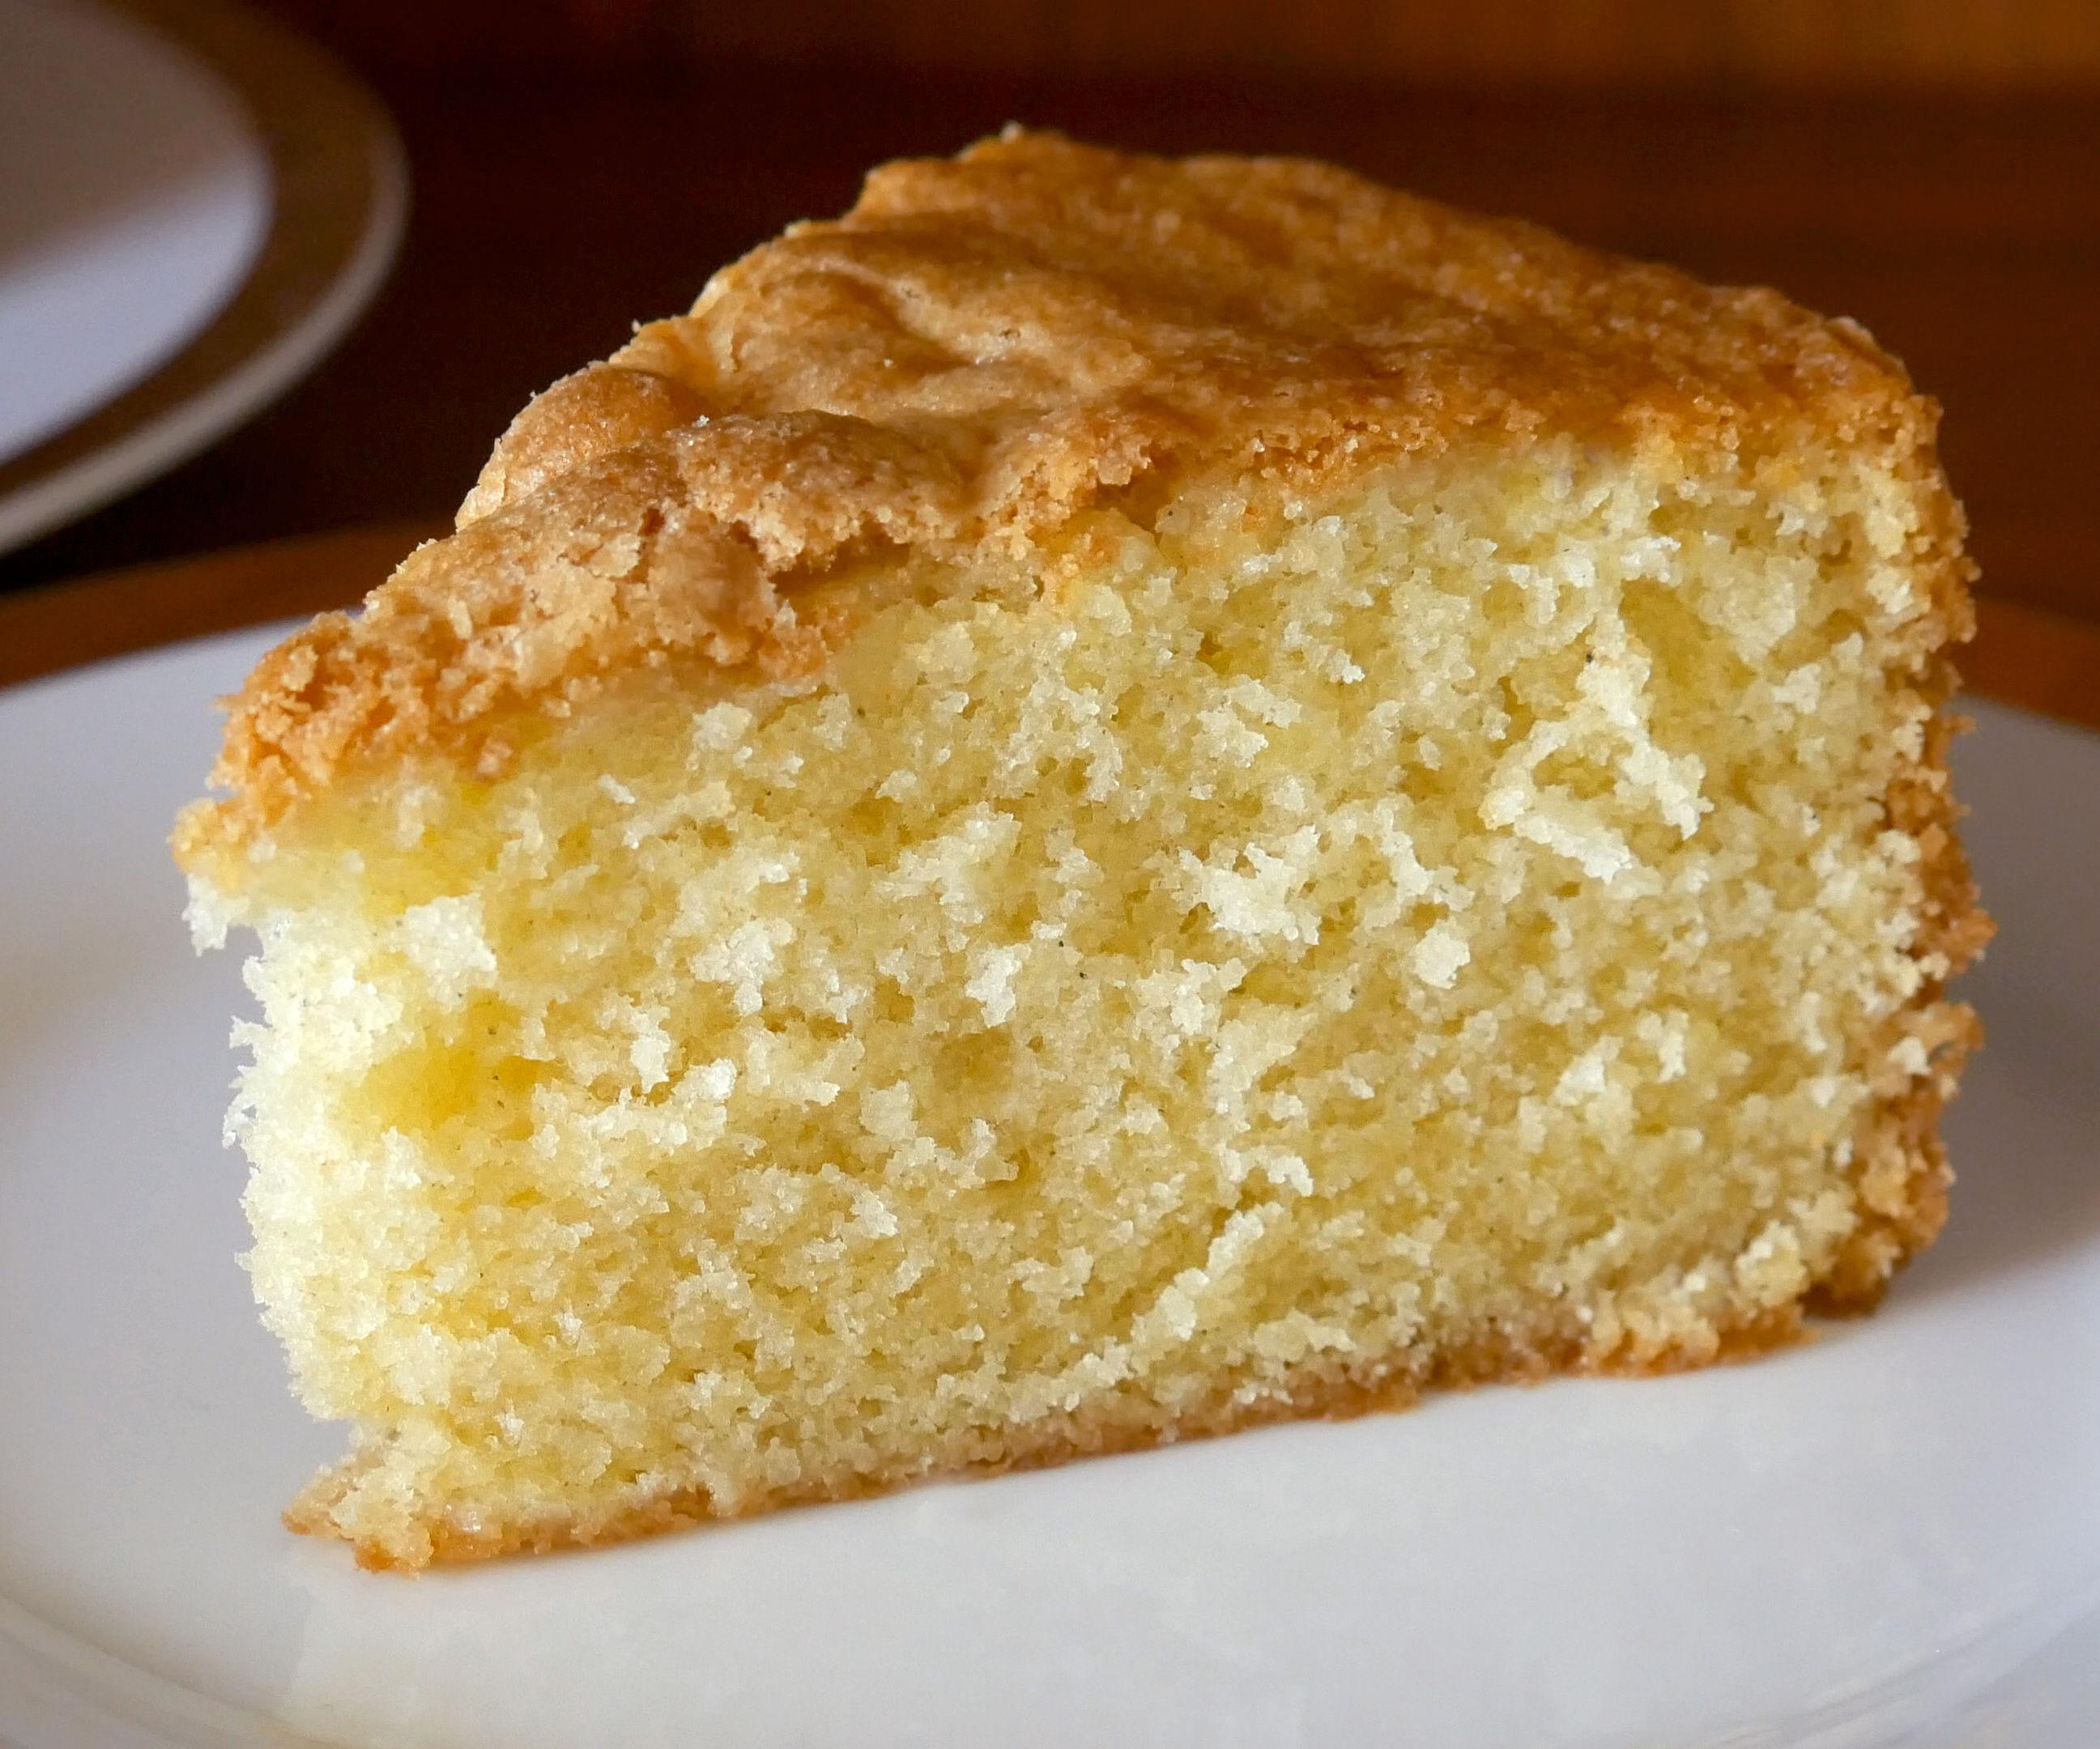 SIMPLE VANILLA SPONGE (POUND) CAKE